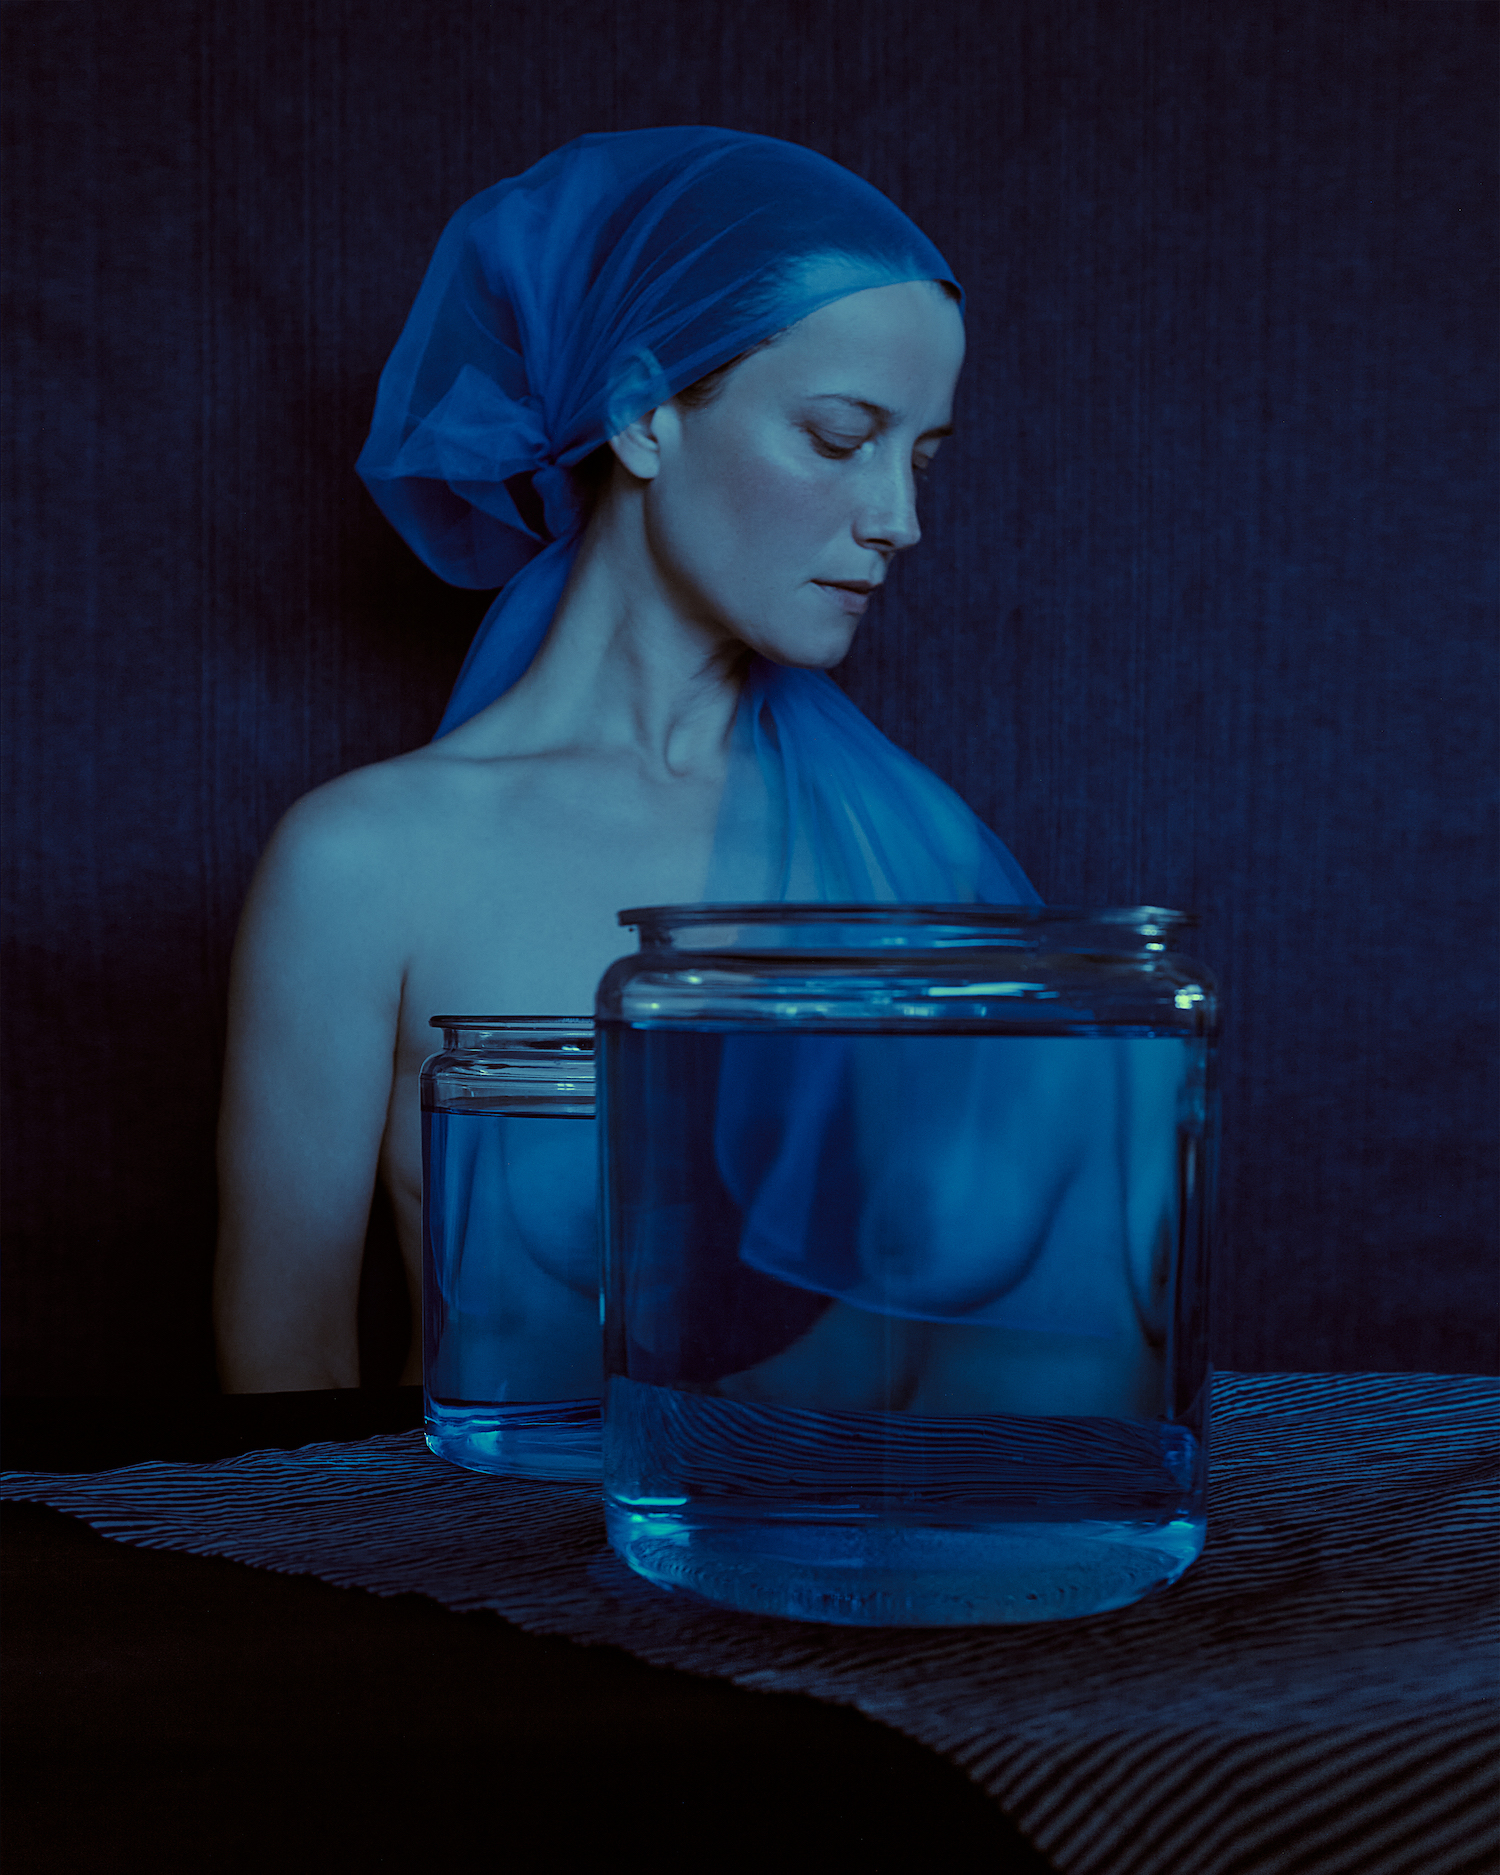 © Galina Semenova - Journey into thyself